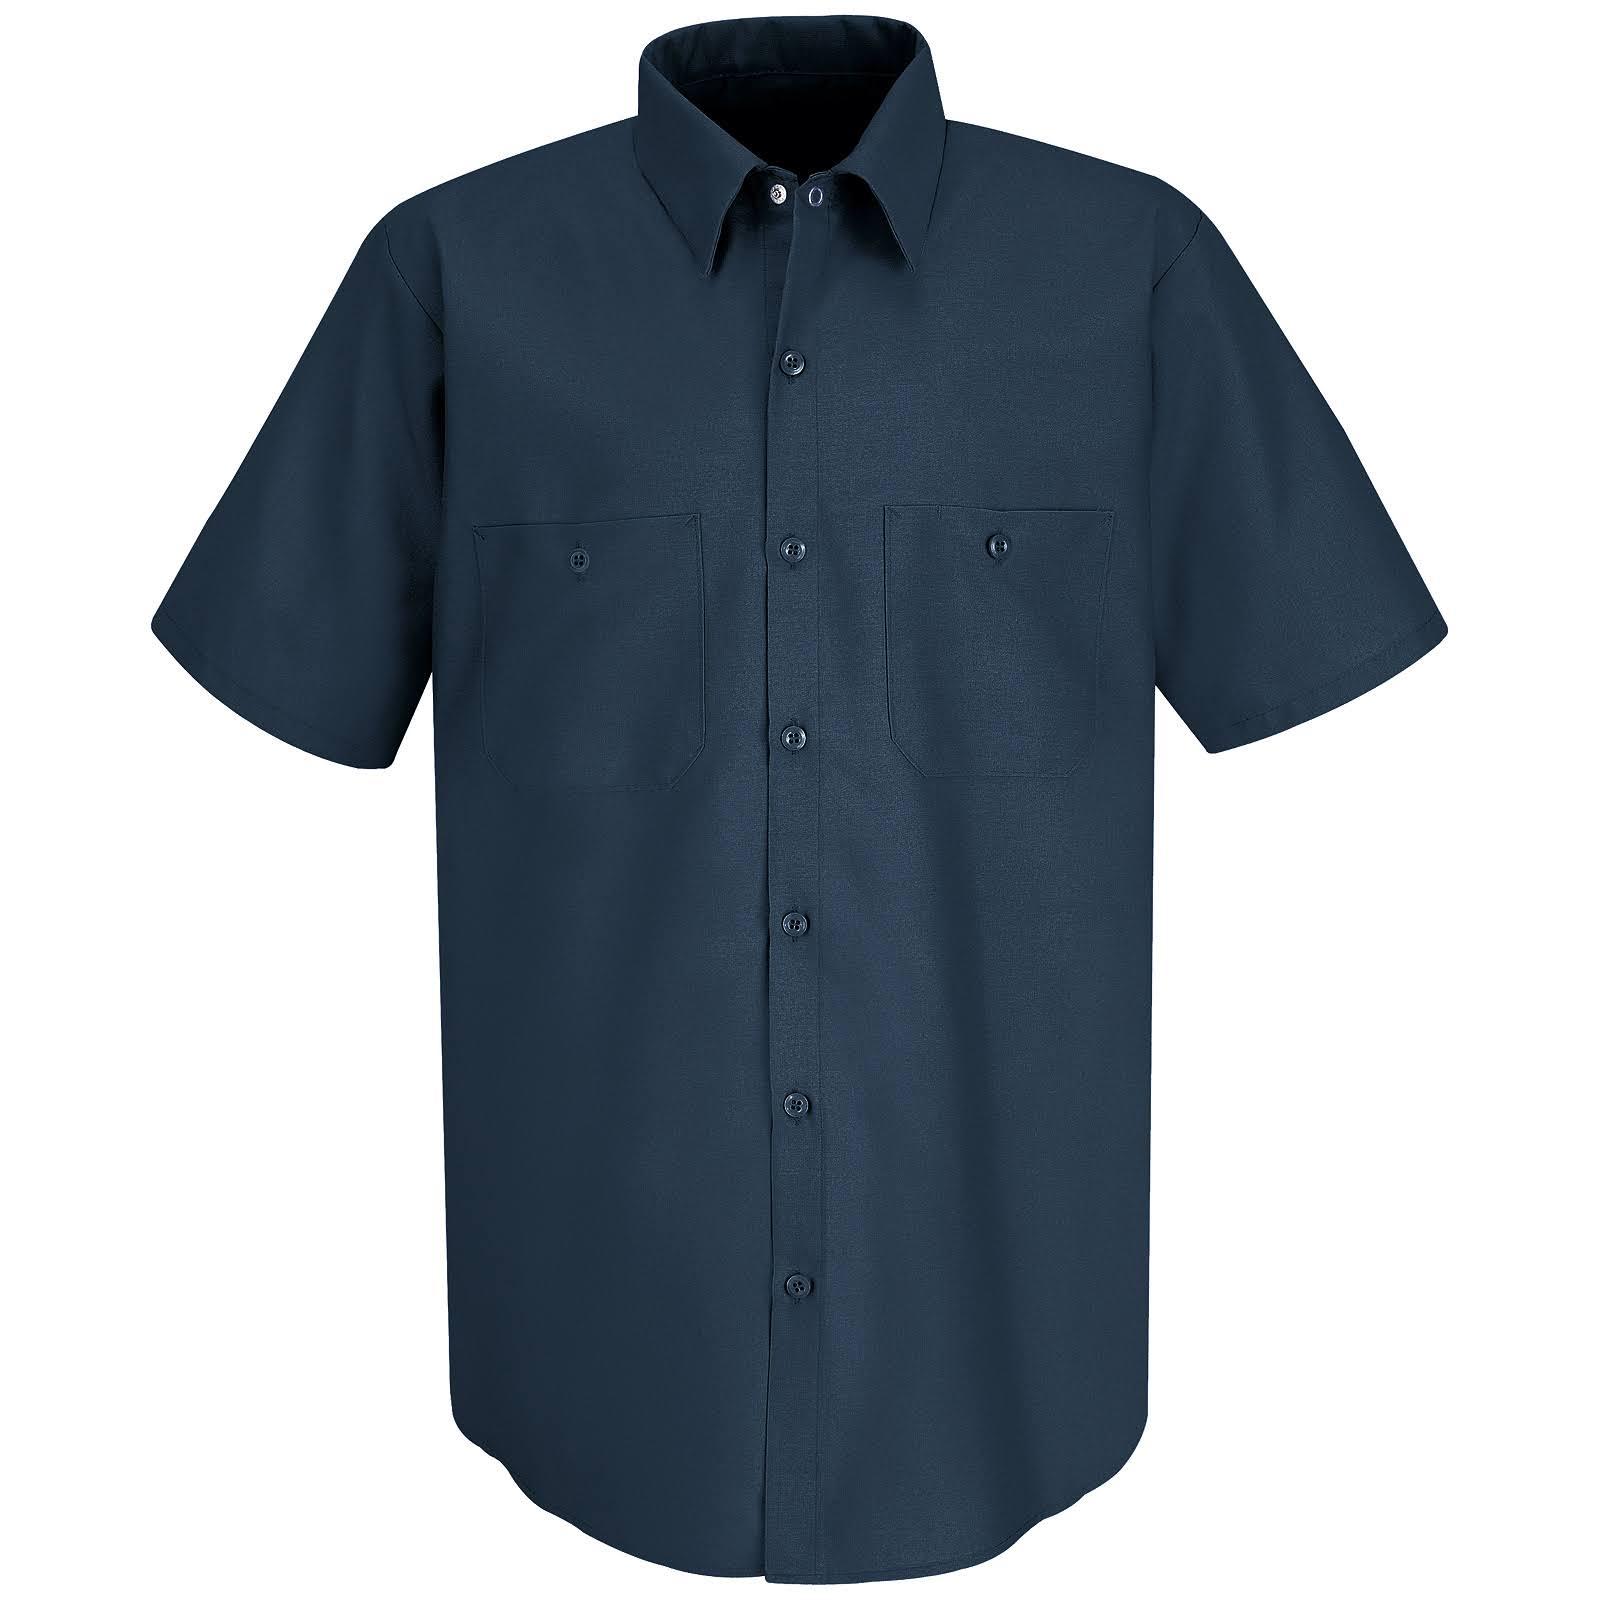 Red Kap De Regular Corta Industrial Corte Camisa Manga Hombre Trabajo Para waHXqFxq